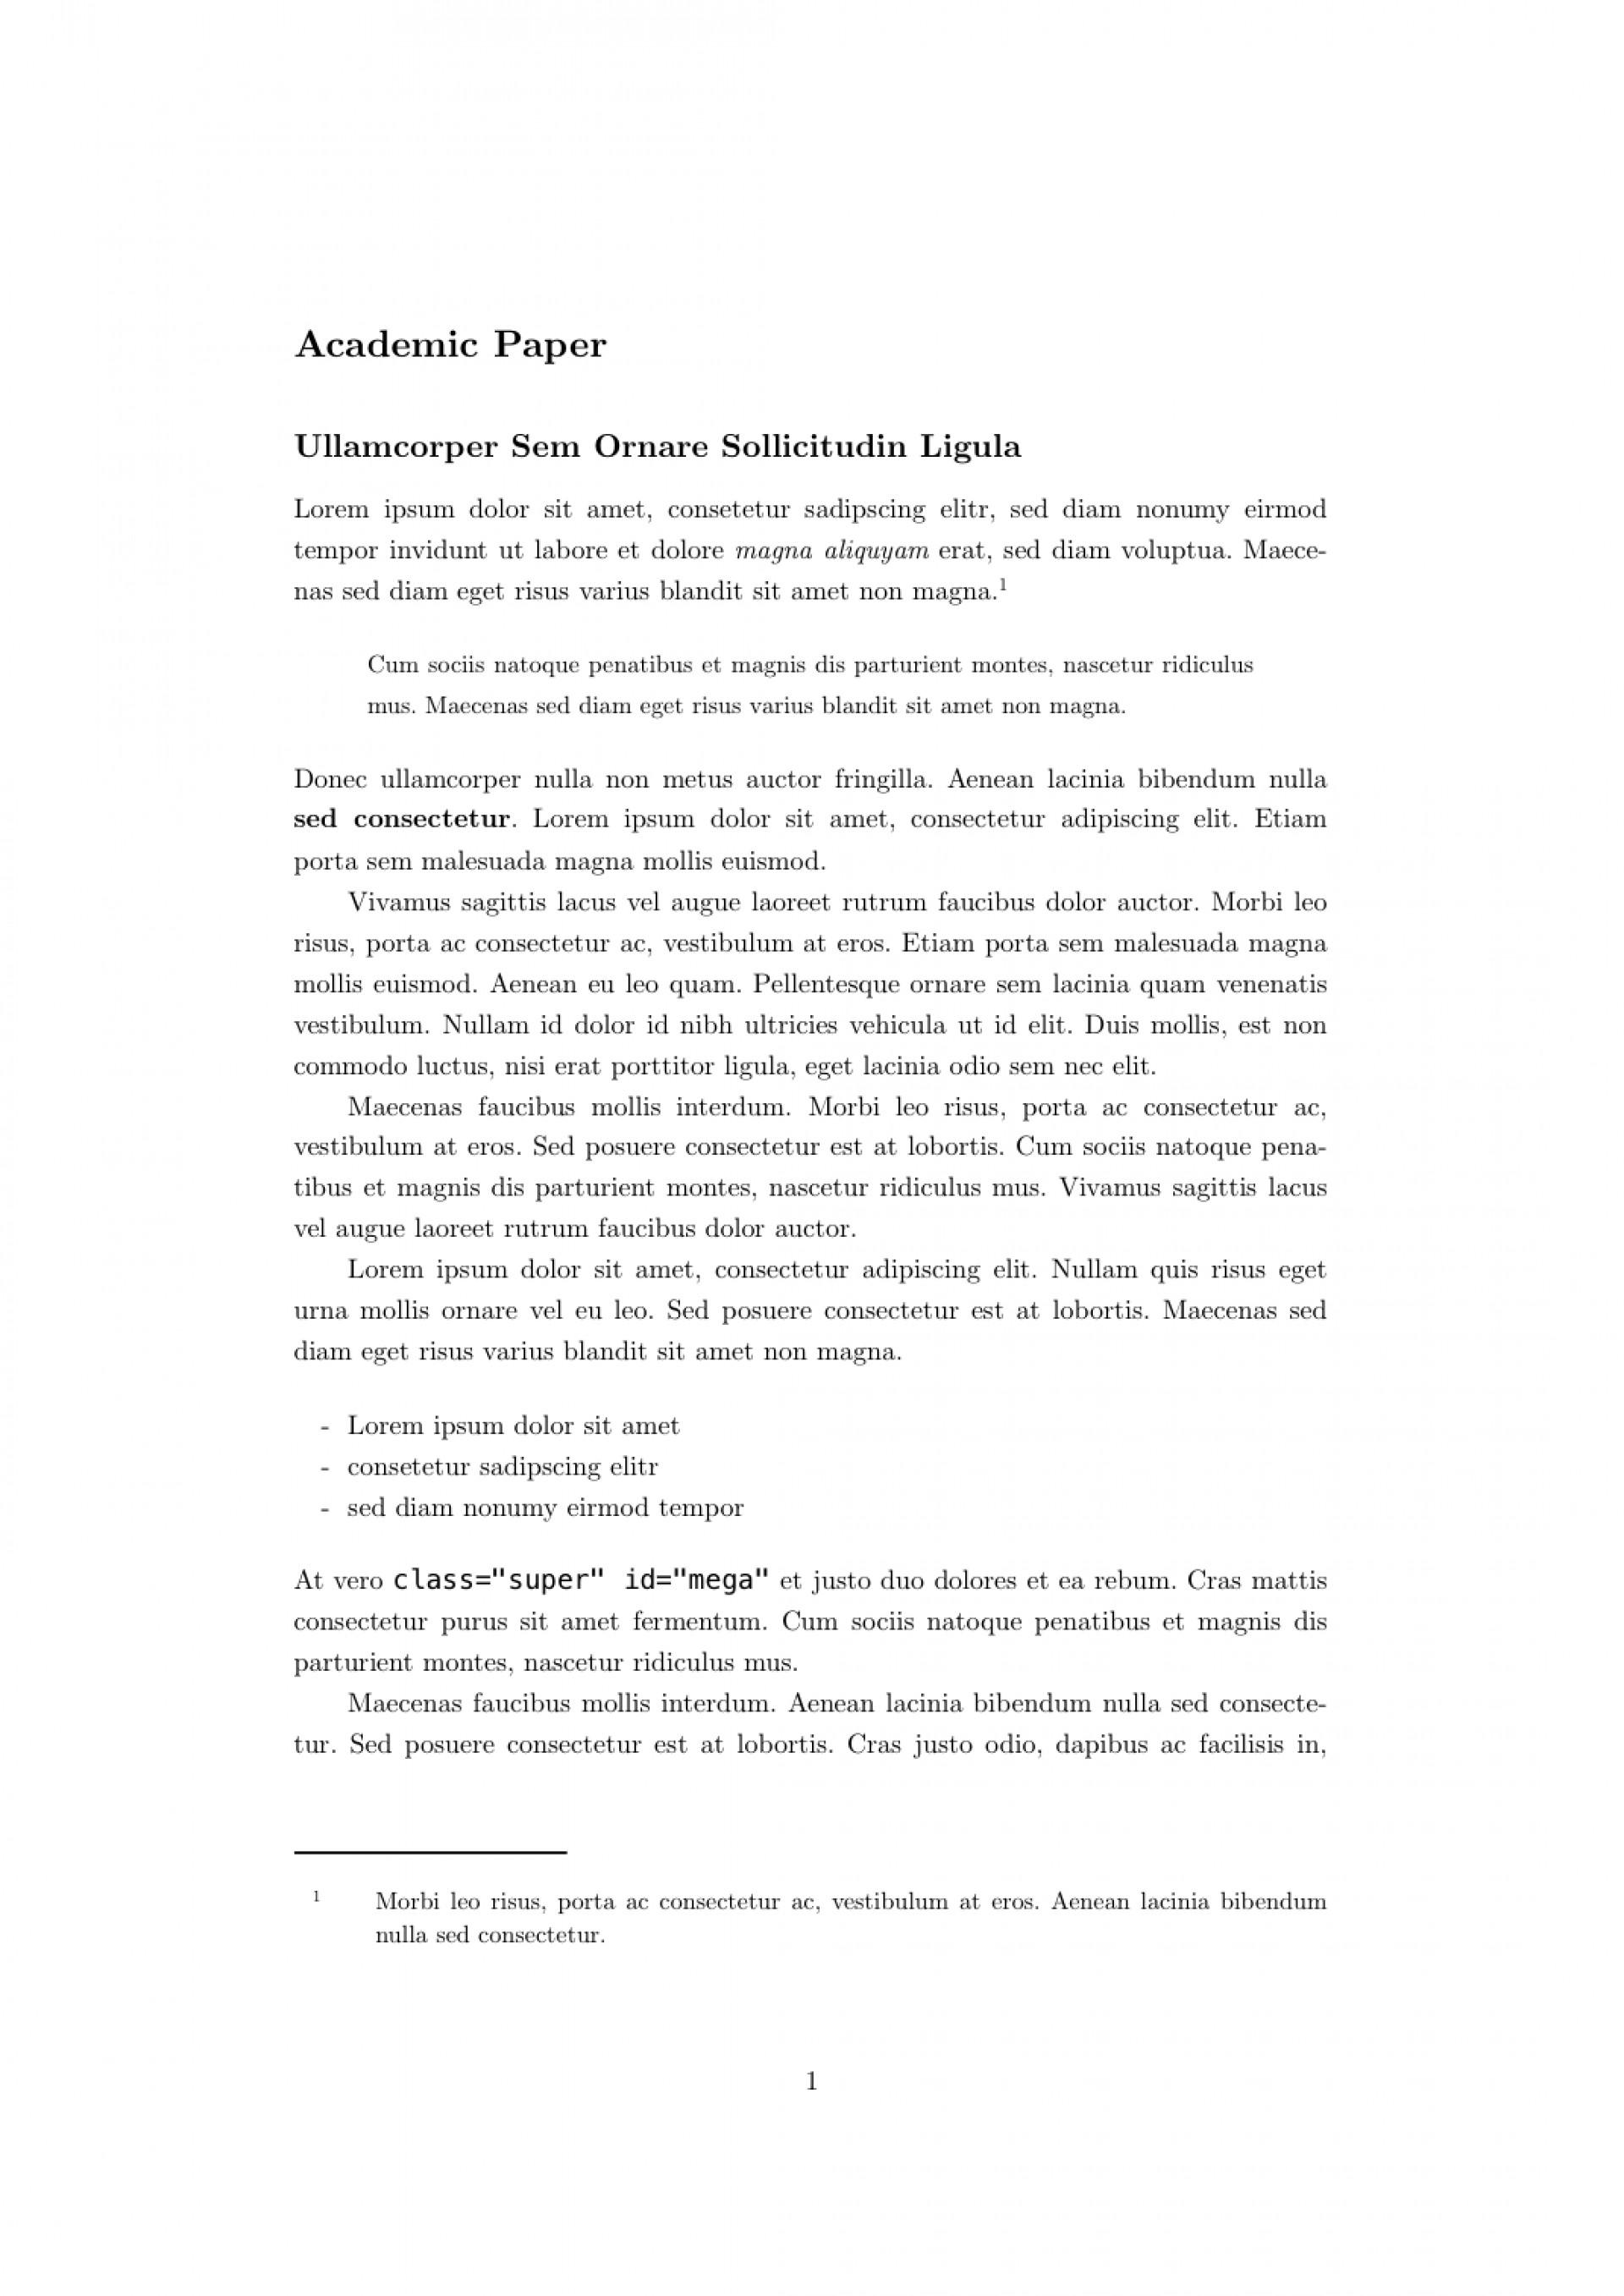 002 Academic Style Essay Example Fascinating Formal University Samples Harvard 1920